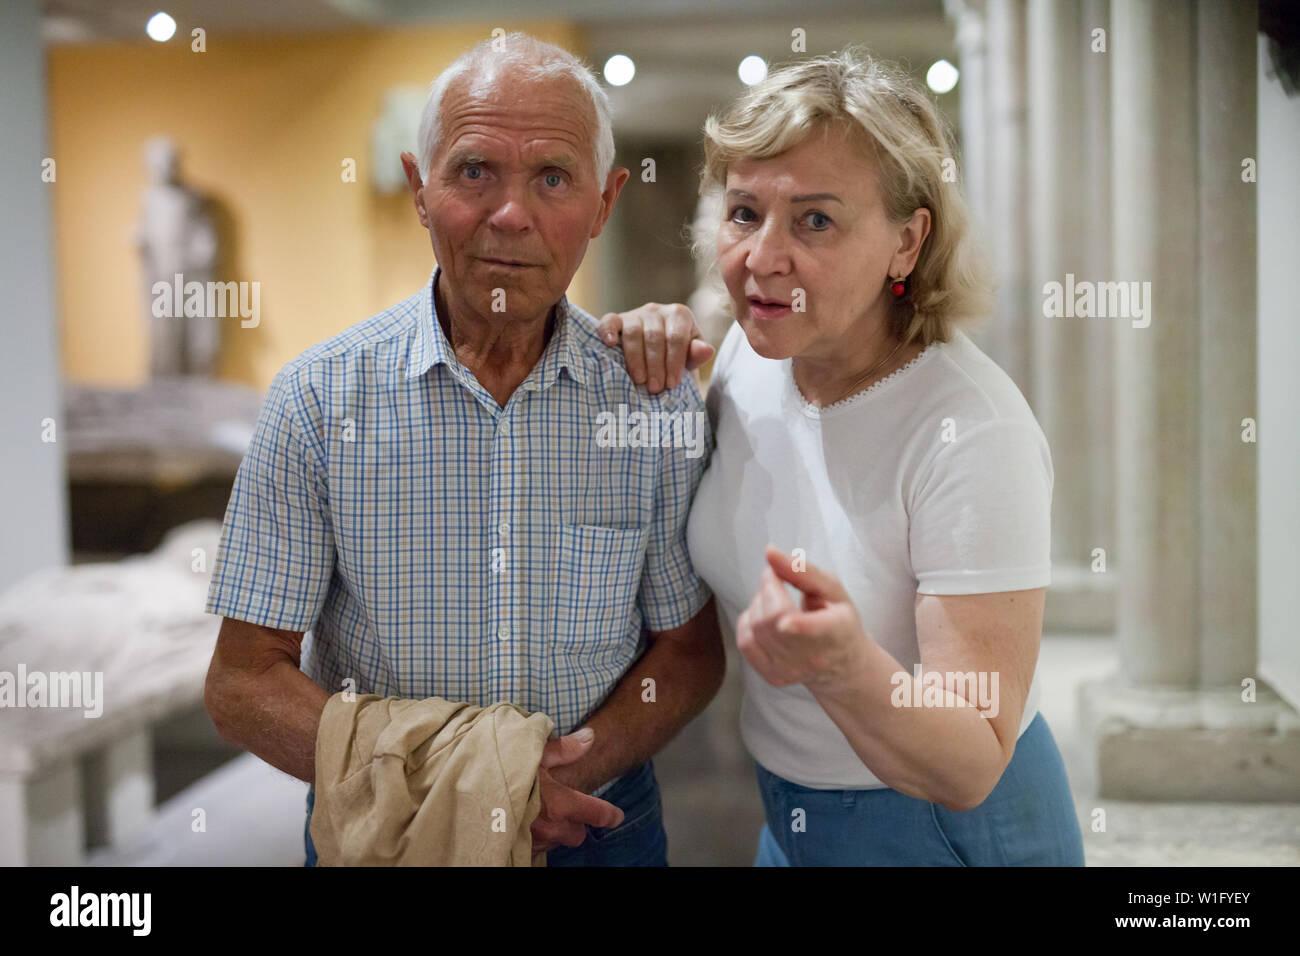 Portrait of senior couple visiting museum of ancient art - Stock Image